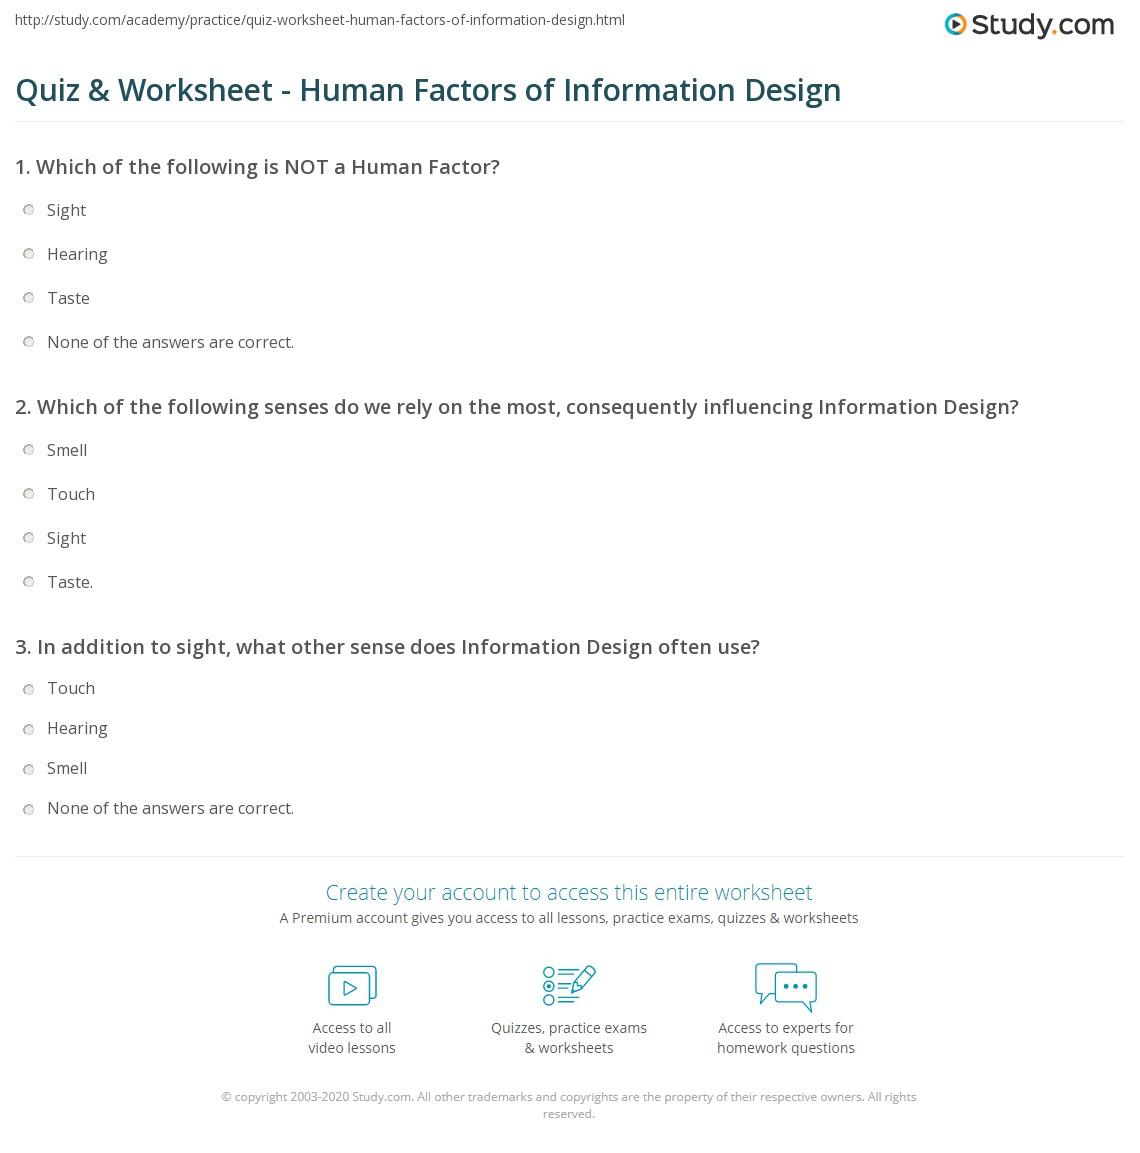 Quiz Worksheet Human Factors Of Information Design Study Com